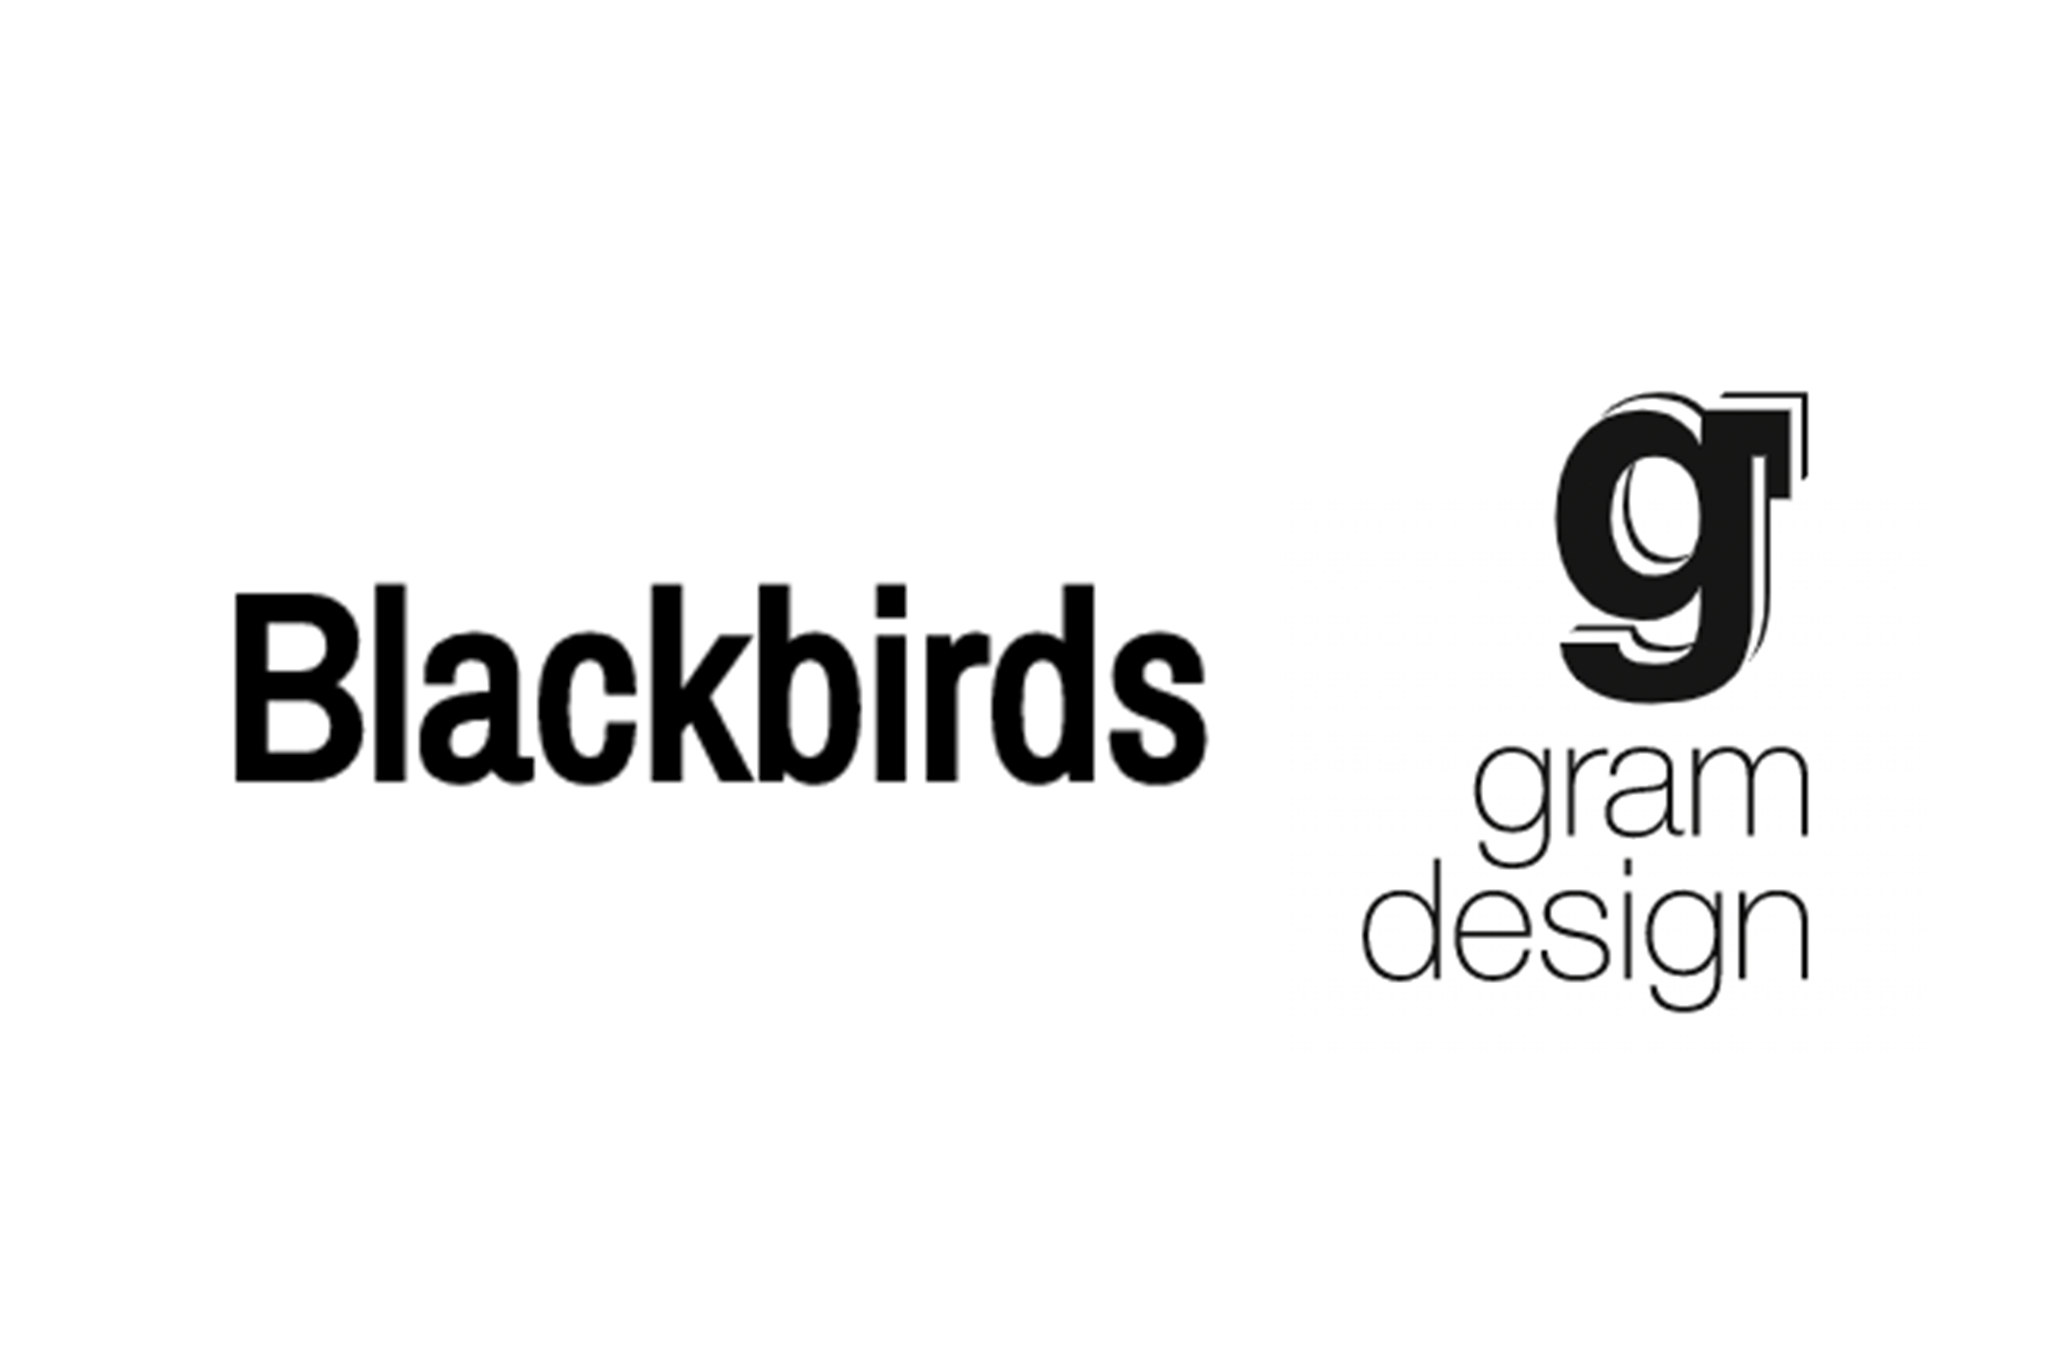 Blackbirds & Gram